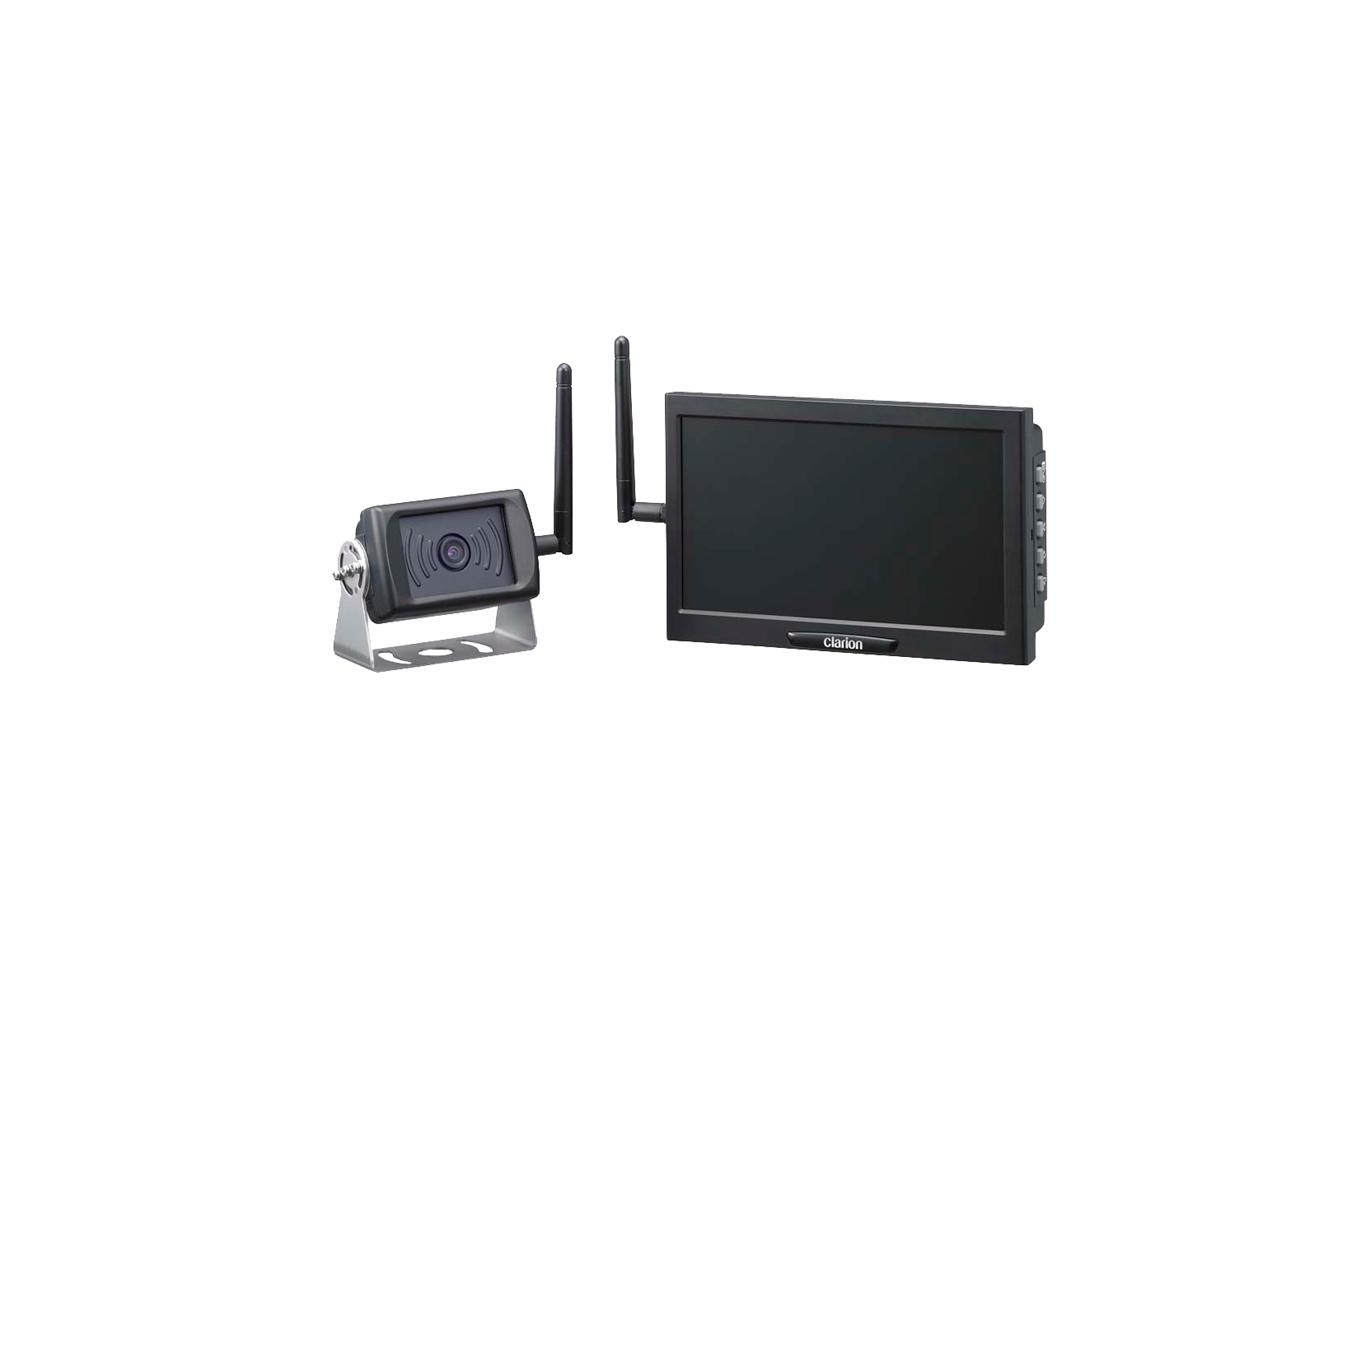 FH Wireless Camera System